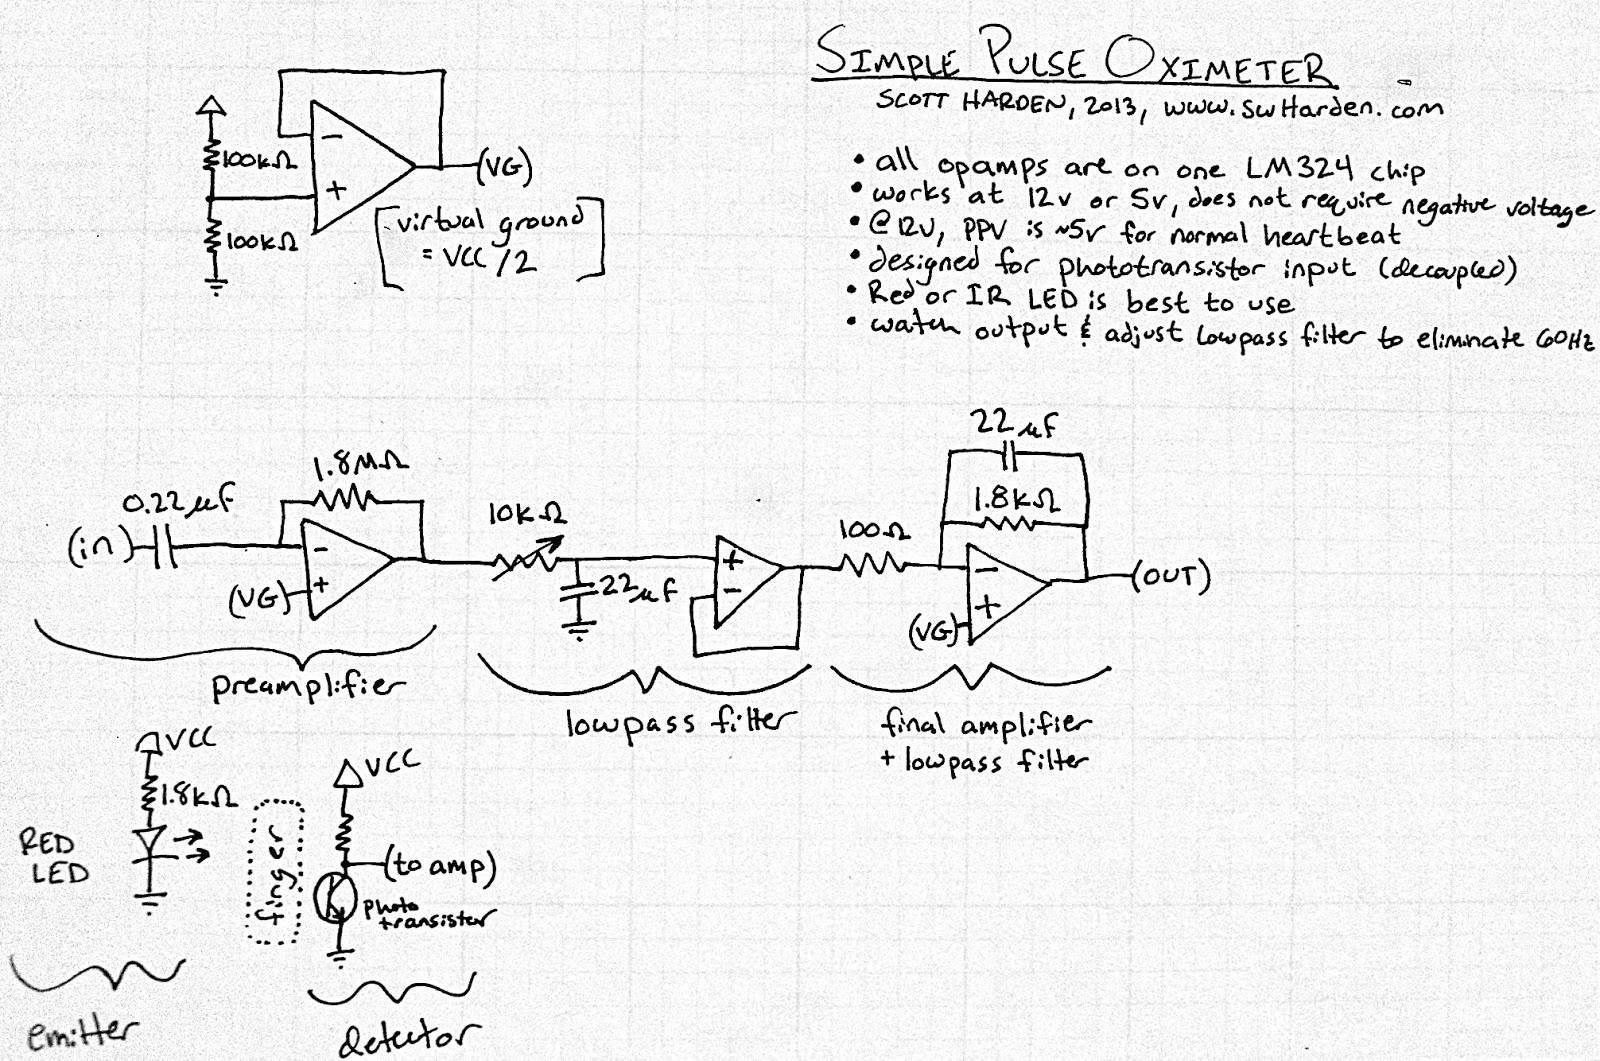 simple pulse oximeter circuit diagram electronic circuits diagram simple pulse oximeter circuit diagram [ 1600 x 1061 Pixel ]